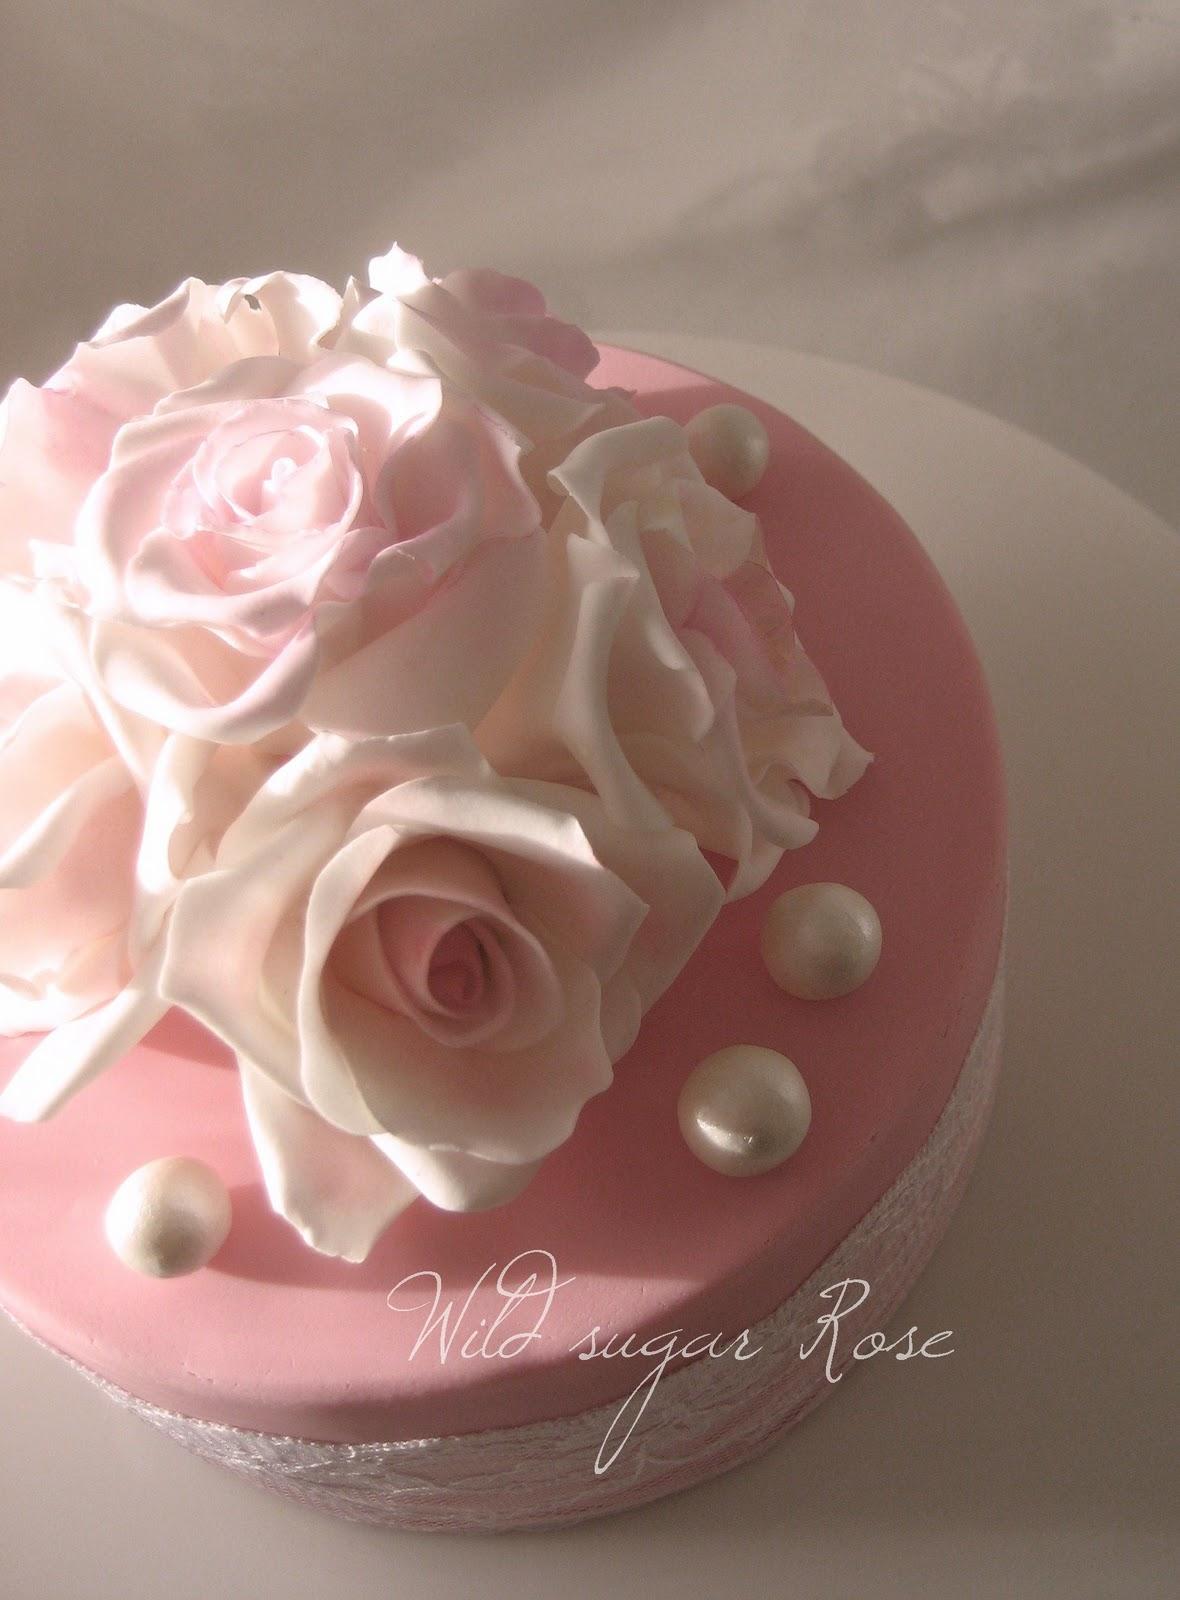 Wild sugar Rose - wedding cakes, cupcakes and cake ...